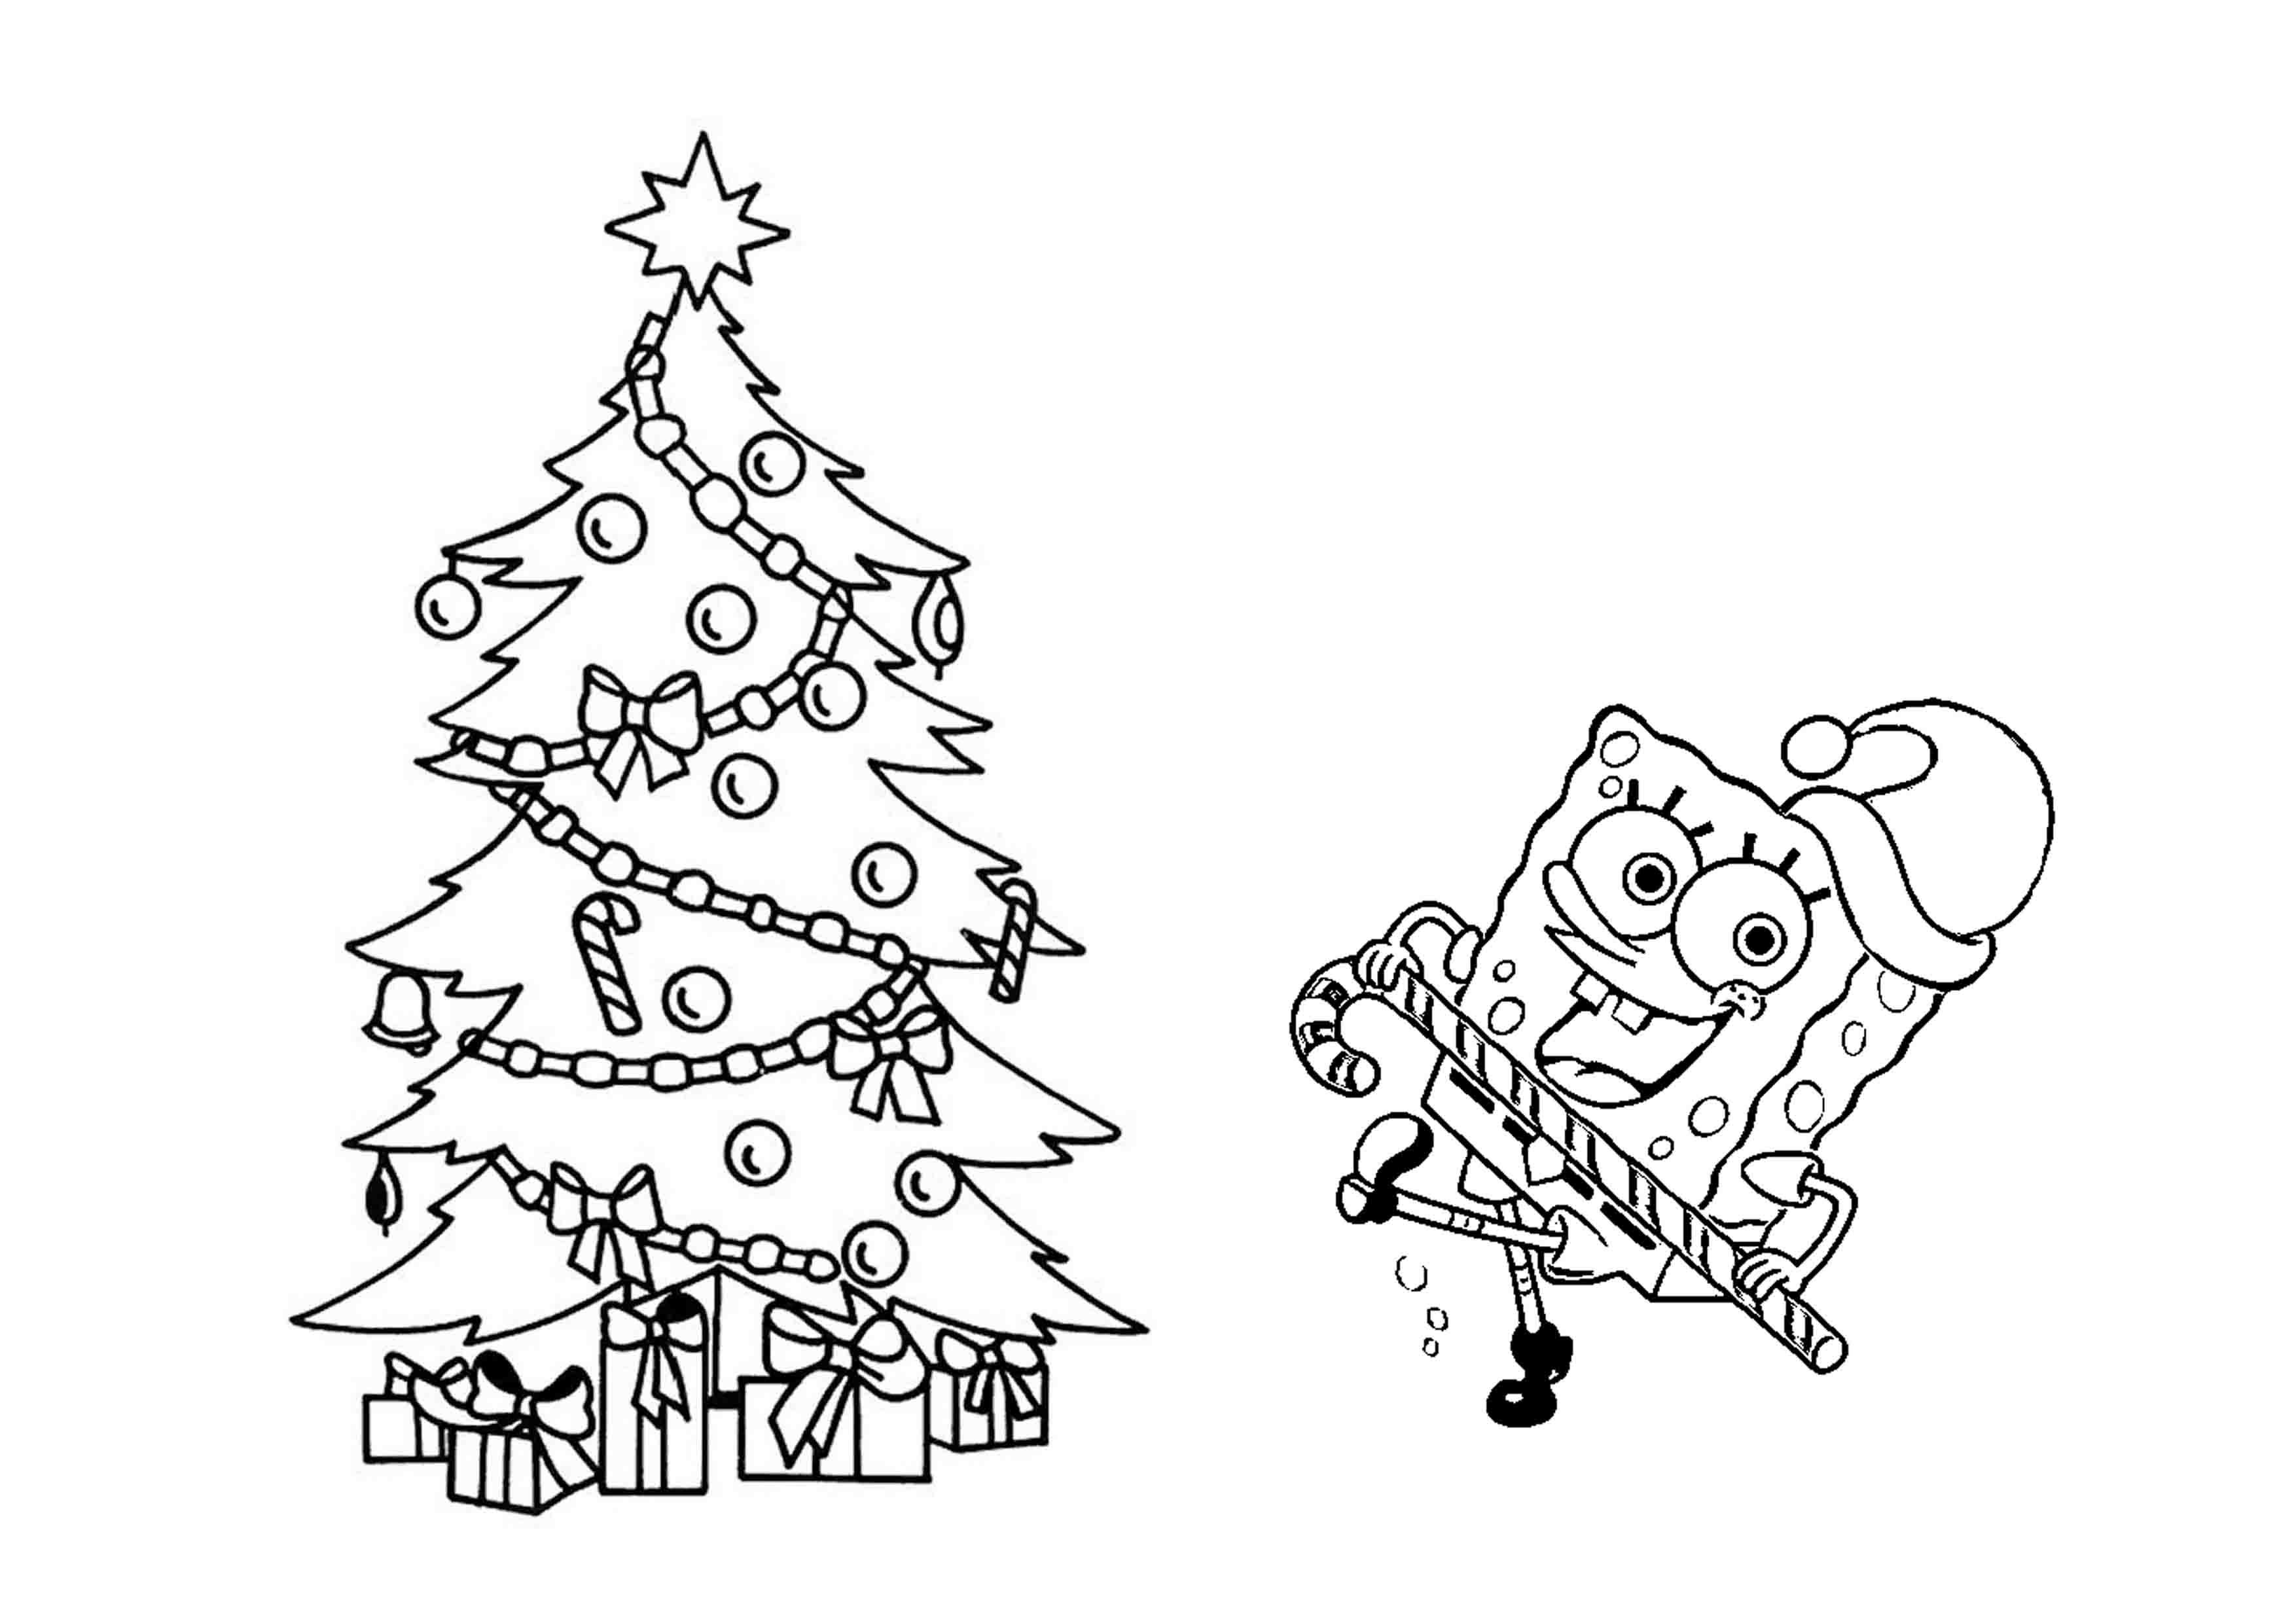 Christmas Color Pages For Kids Printable Christmas Coloring Pages For Kids Best Apps For Kids